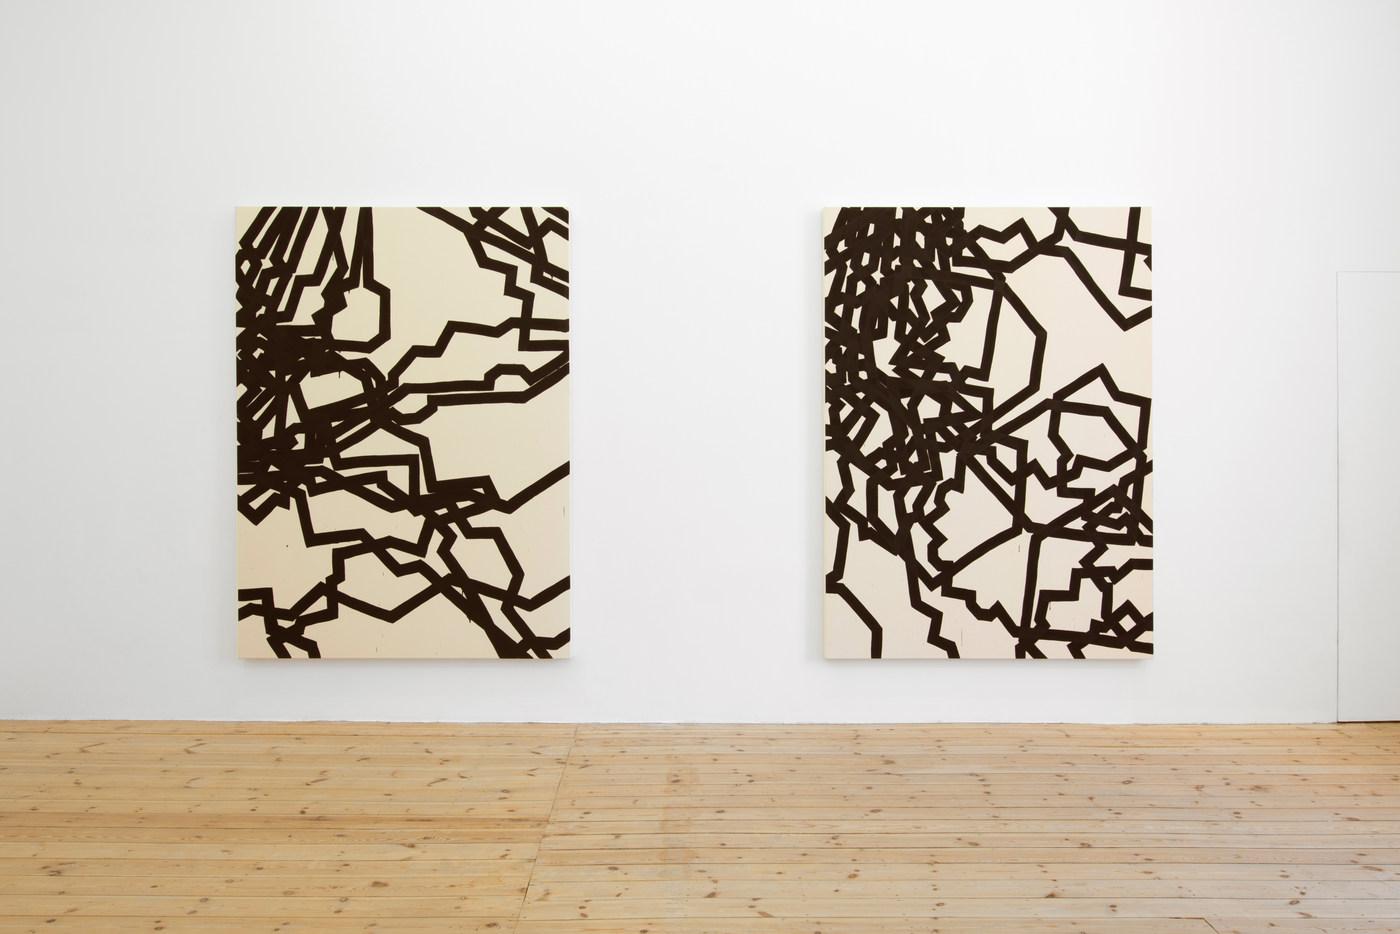 Latifa Echakhch, Derives, 2015, acrylic paint on canvas, 200 x 150 cm -3.jpg